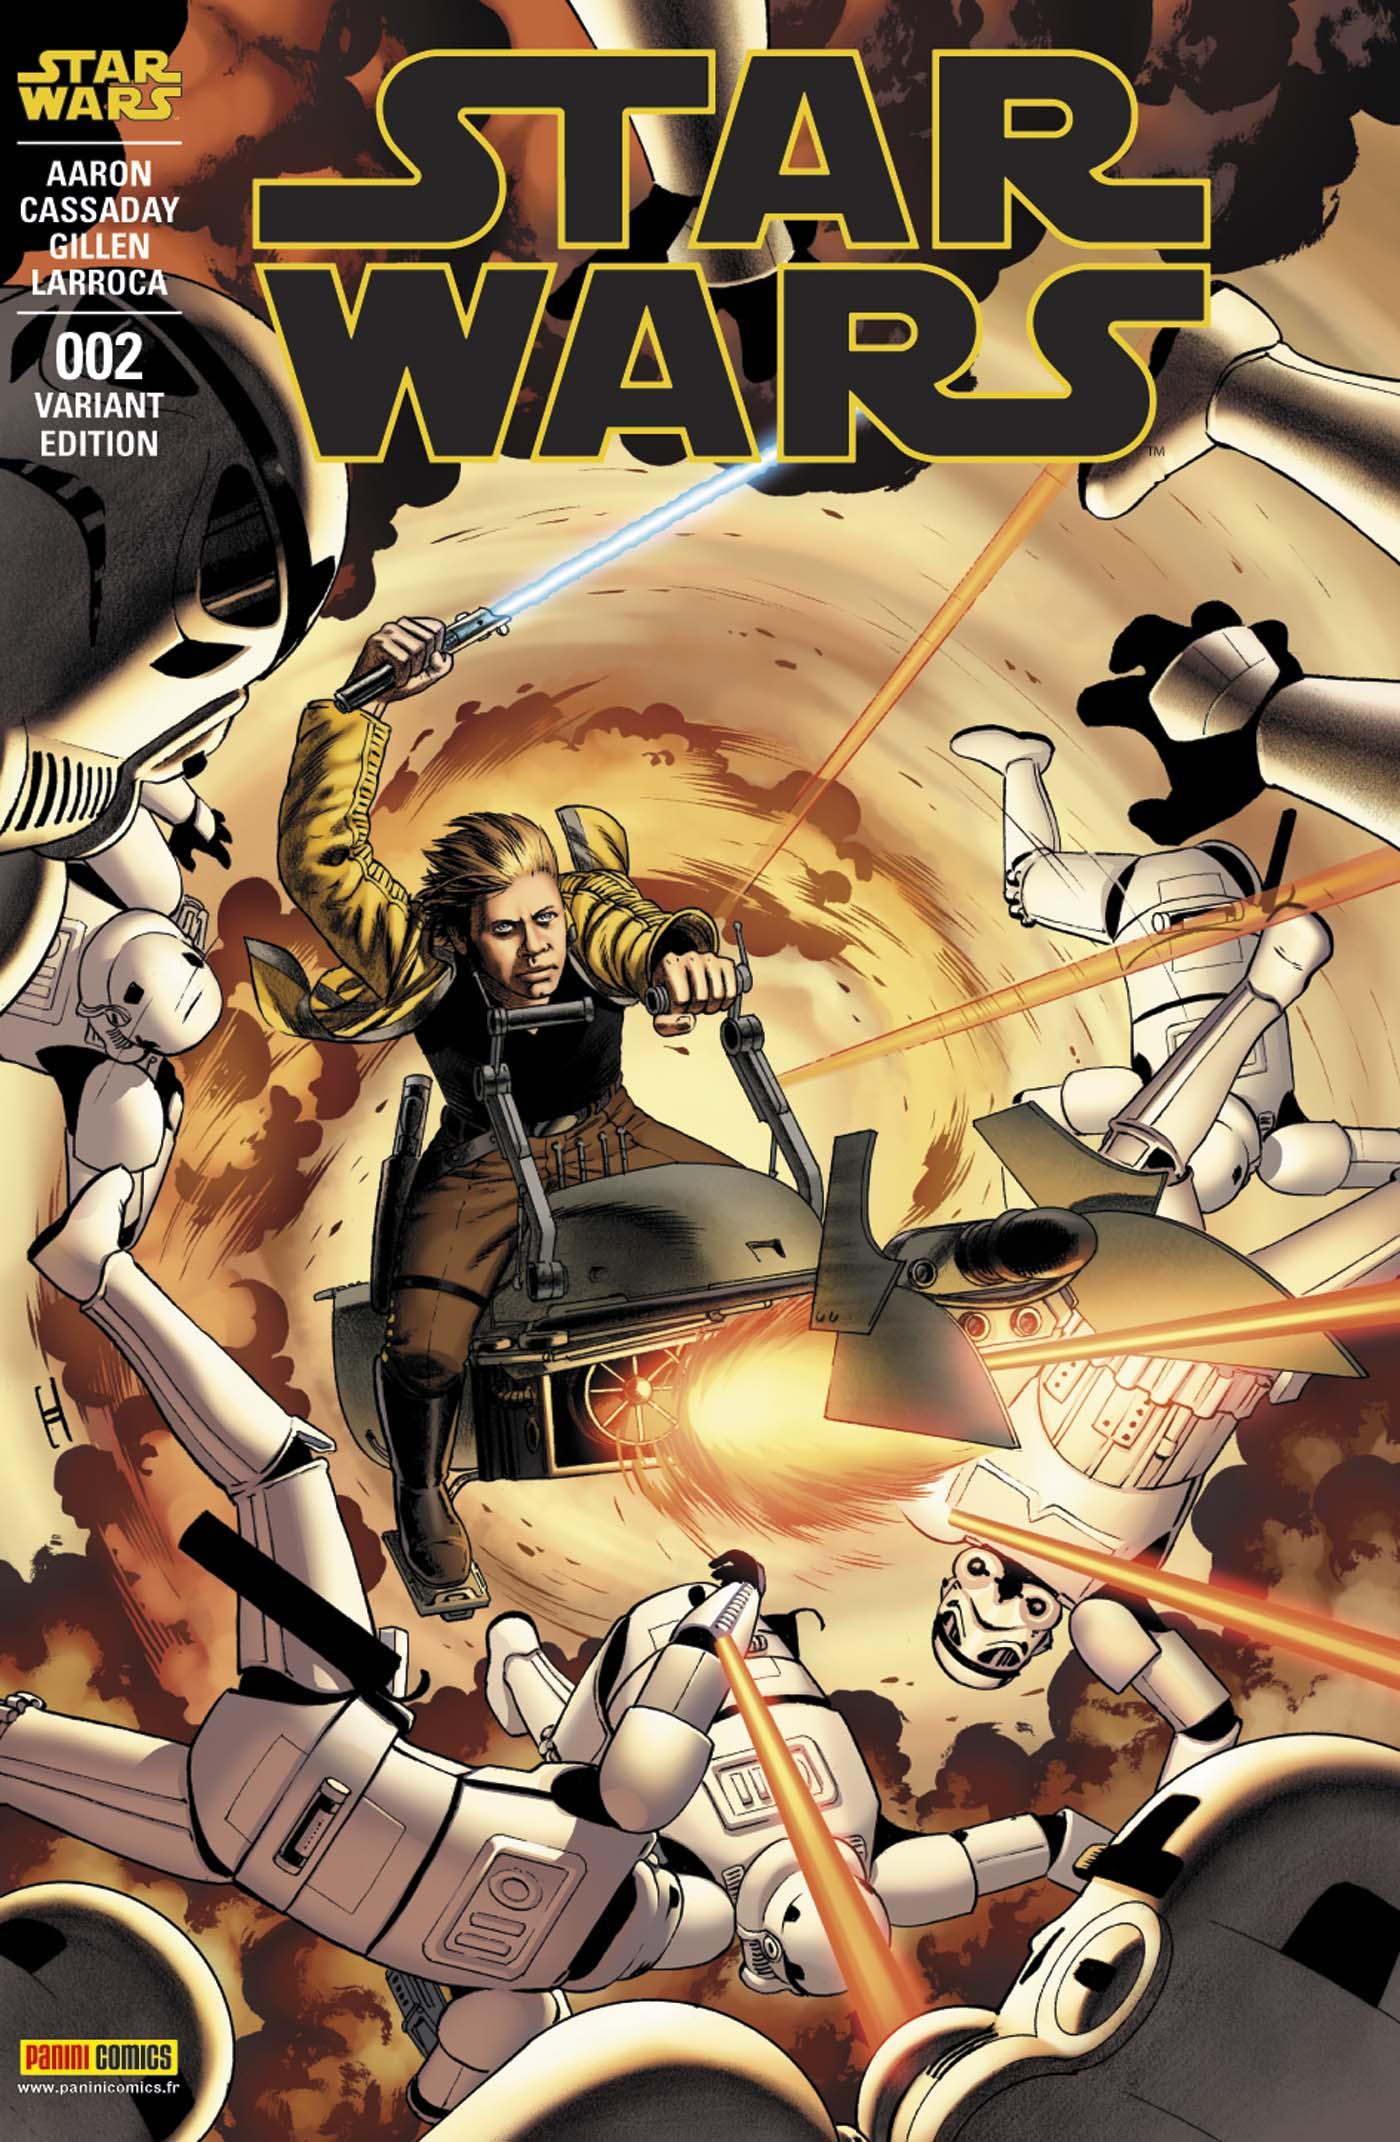 Star Wars 2 - Couverture B (John Cassaday – tirage 25%)